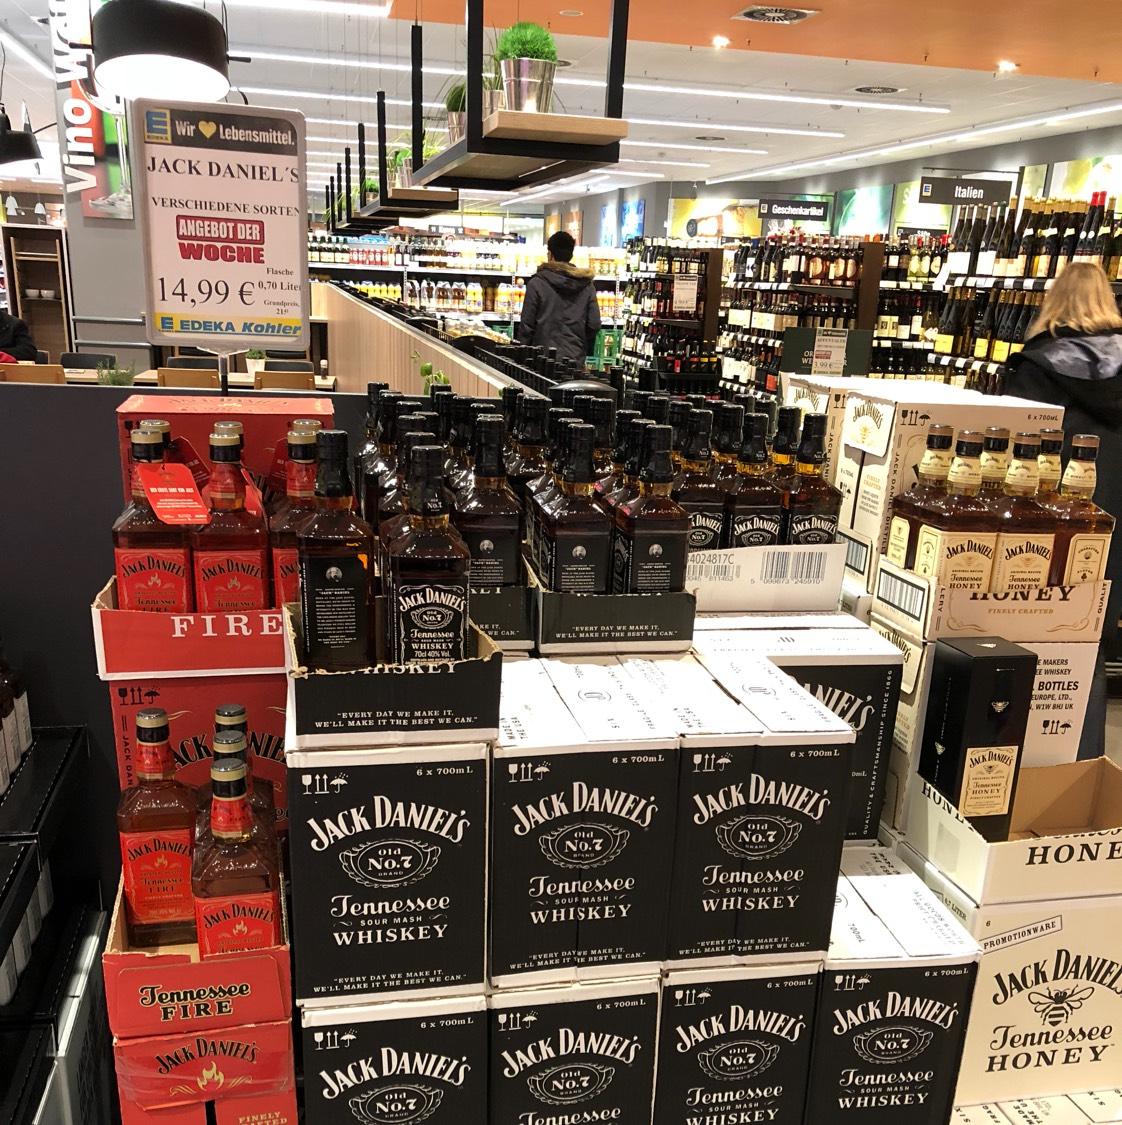 Jack Daniels Lokal Edeka Köhler 77694 Kehl - mydealz.de